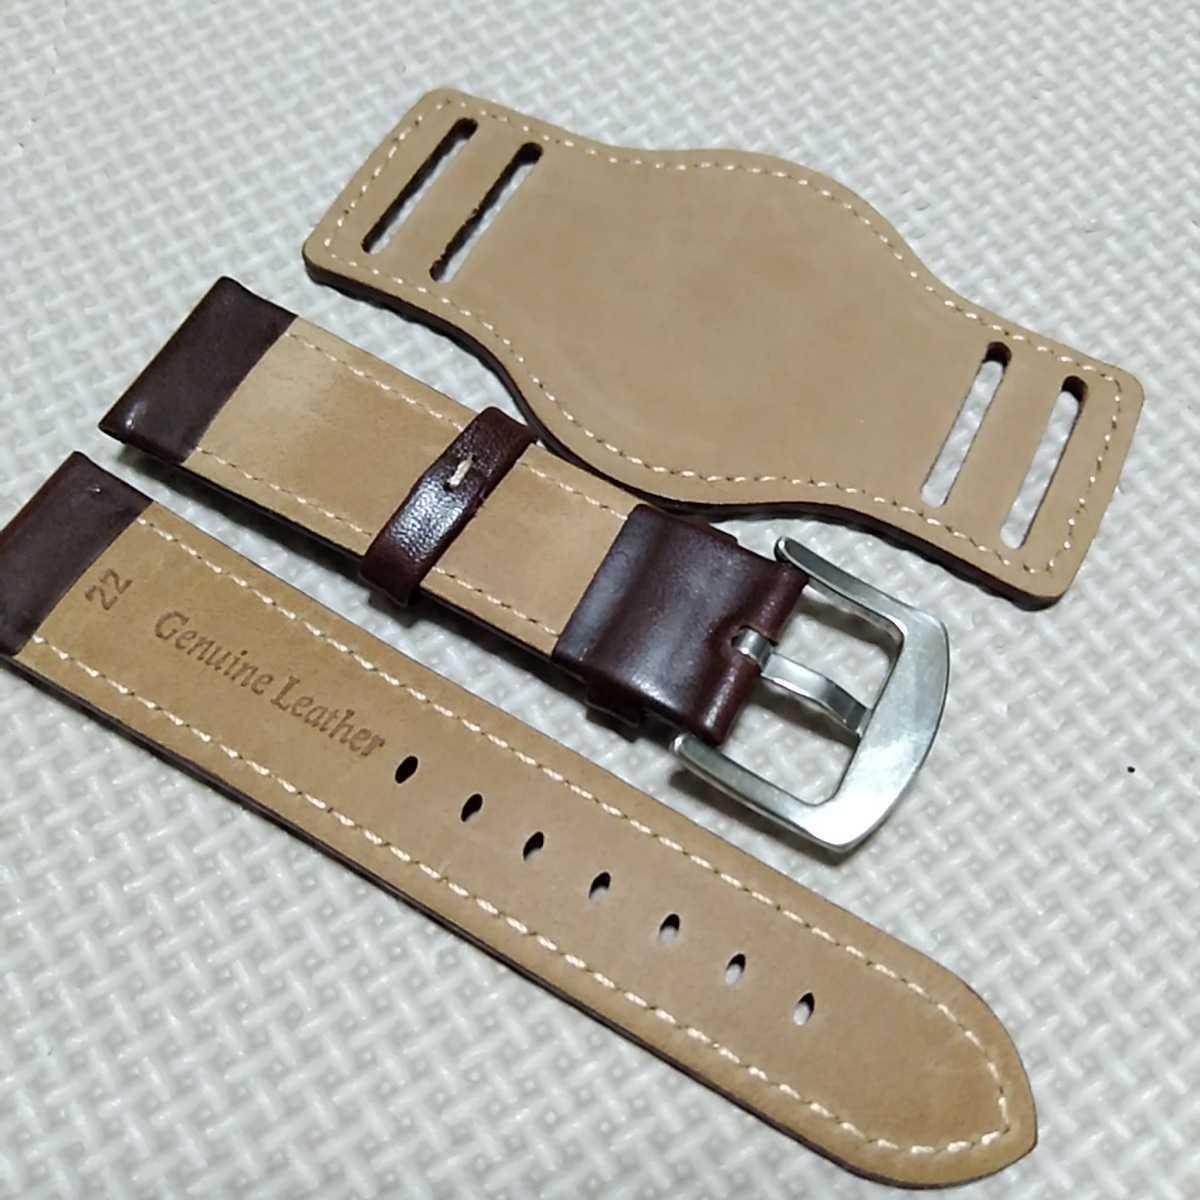 No50 ブンド BUND 本革レザーベルト 腕時計ベルト 交換用ストラップ ブラウン 22mm 未使用 高品質 ドイツパイロット 空軍_画像4